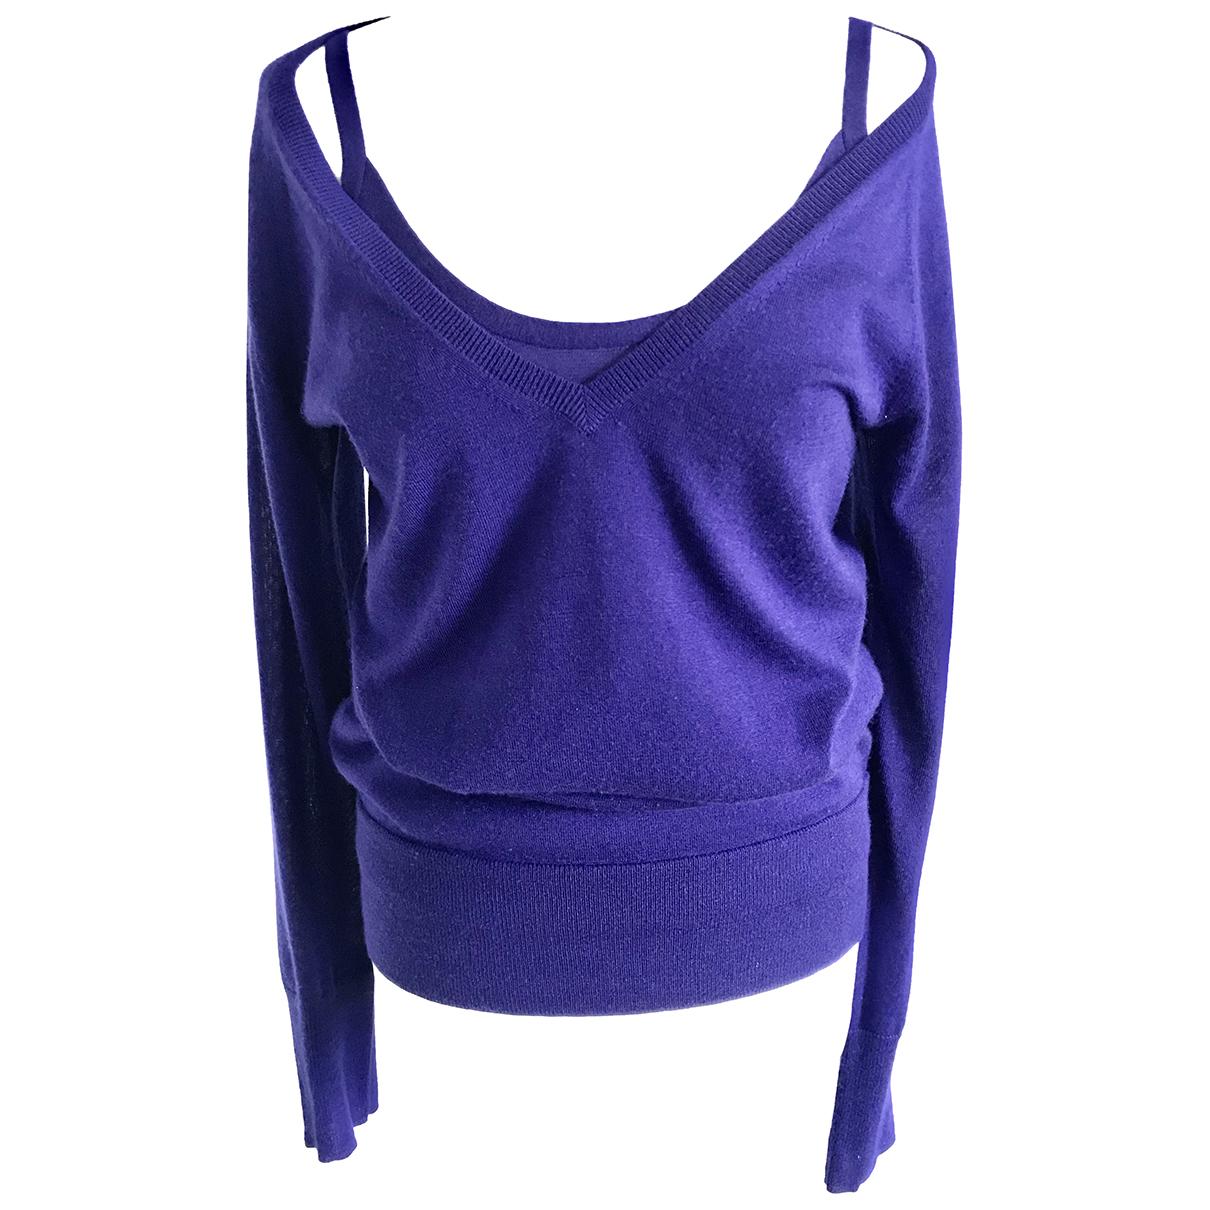 Donna Karan N Blue Cashmere Knitwear for Women M International